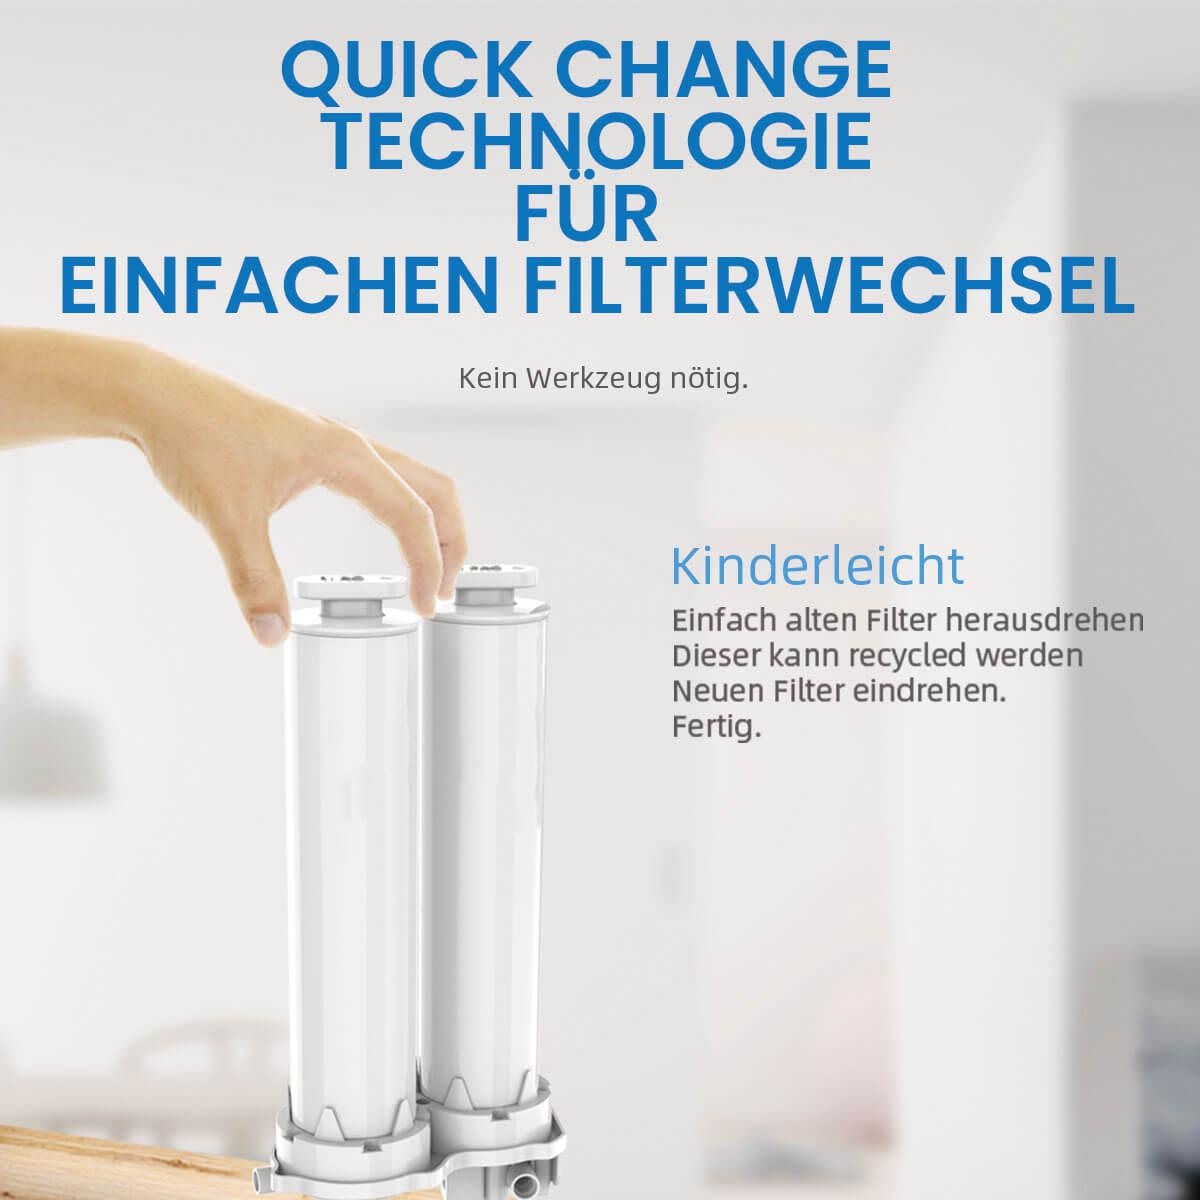 Quick Change Technologie